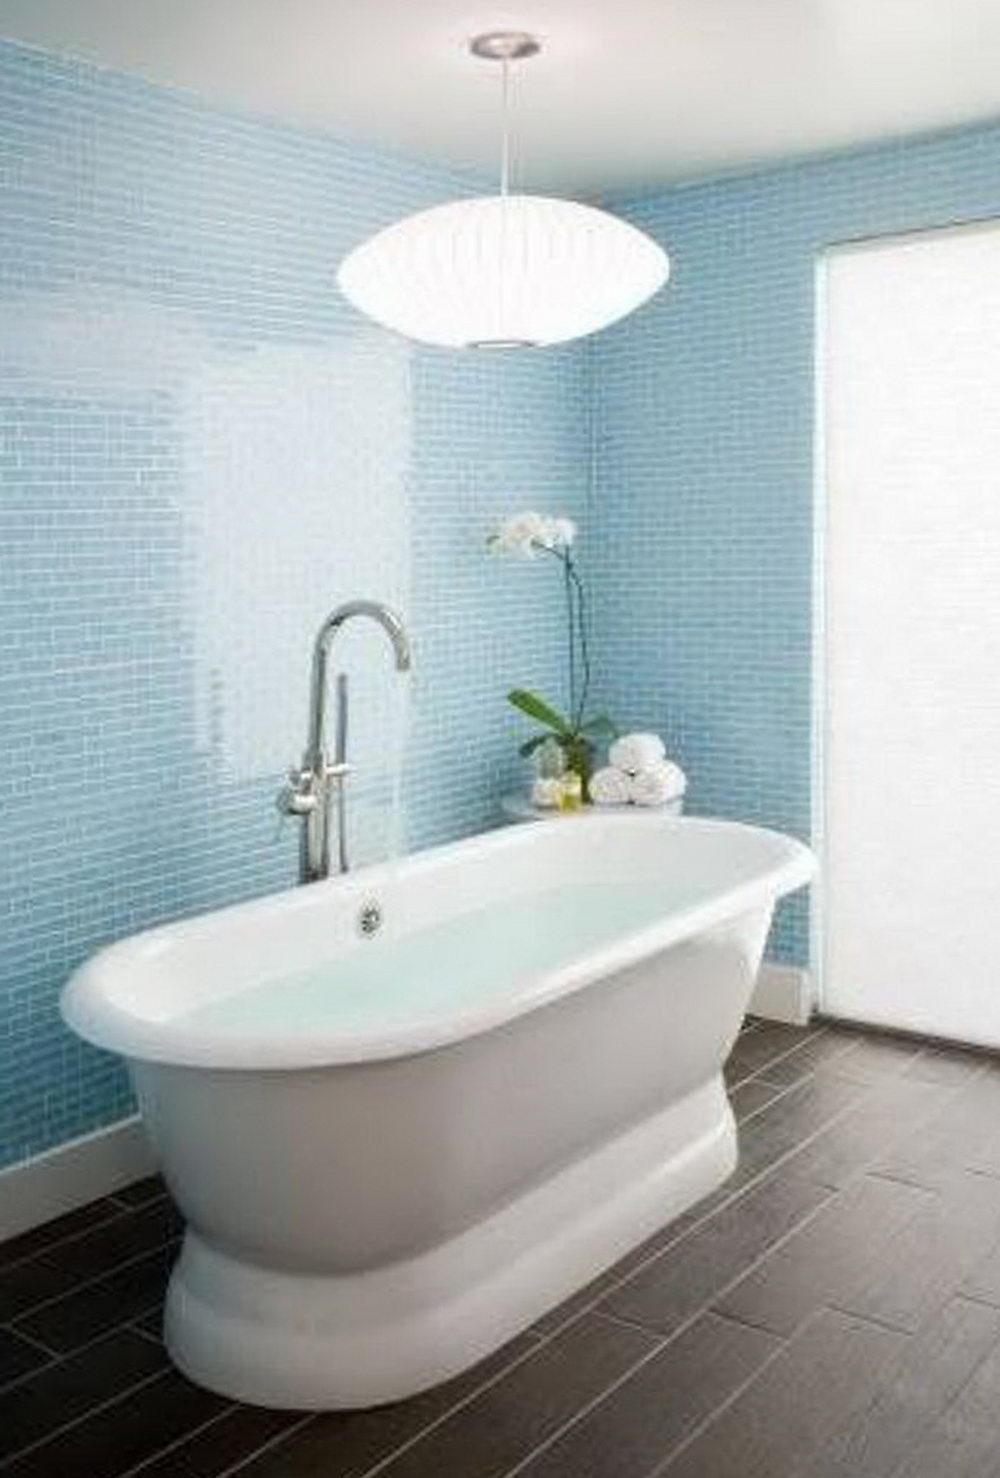 Light Blue Glass Tiles - Glass Tile Bathroom – The Show of Style ...